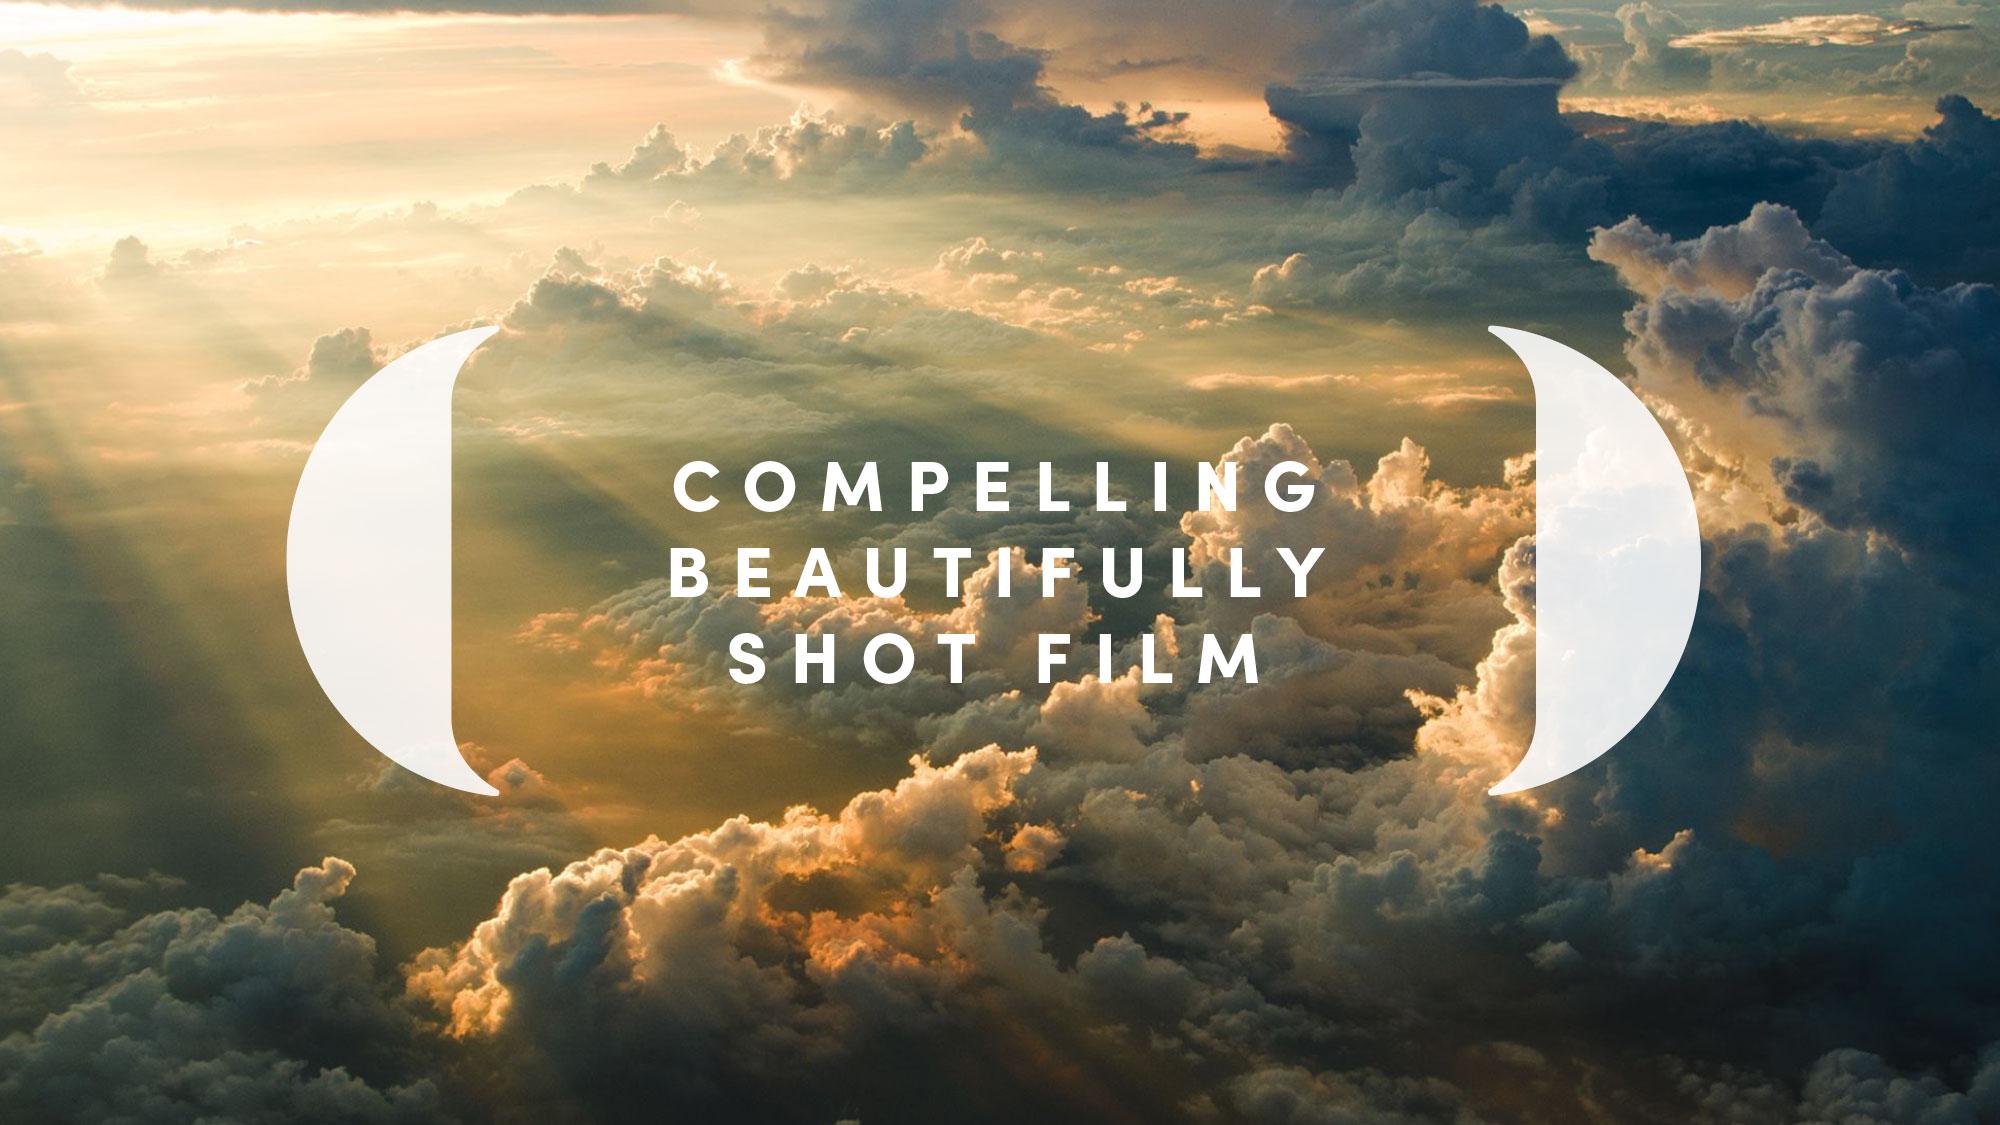 Production company showreel screen 6